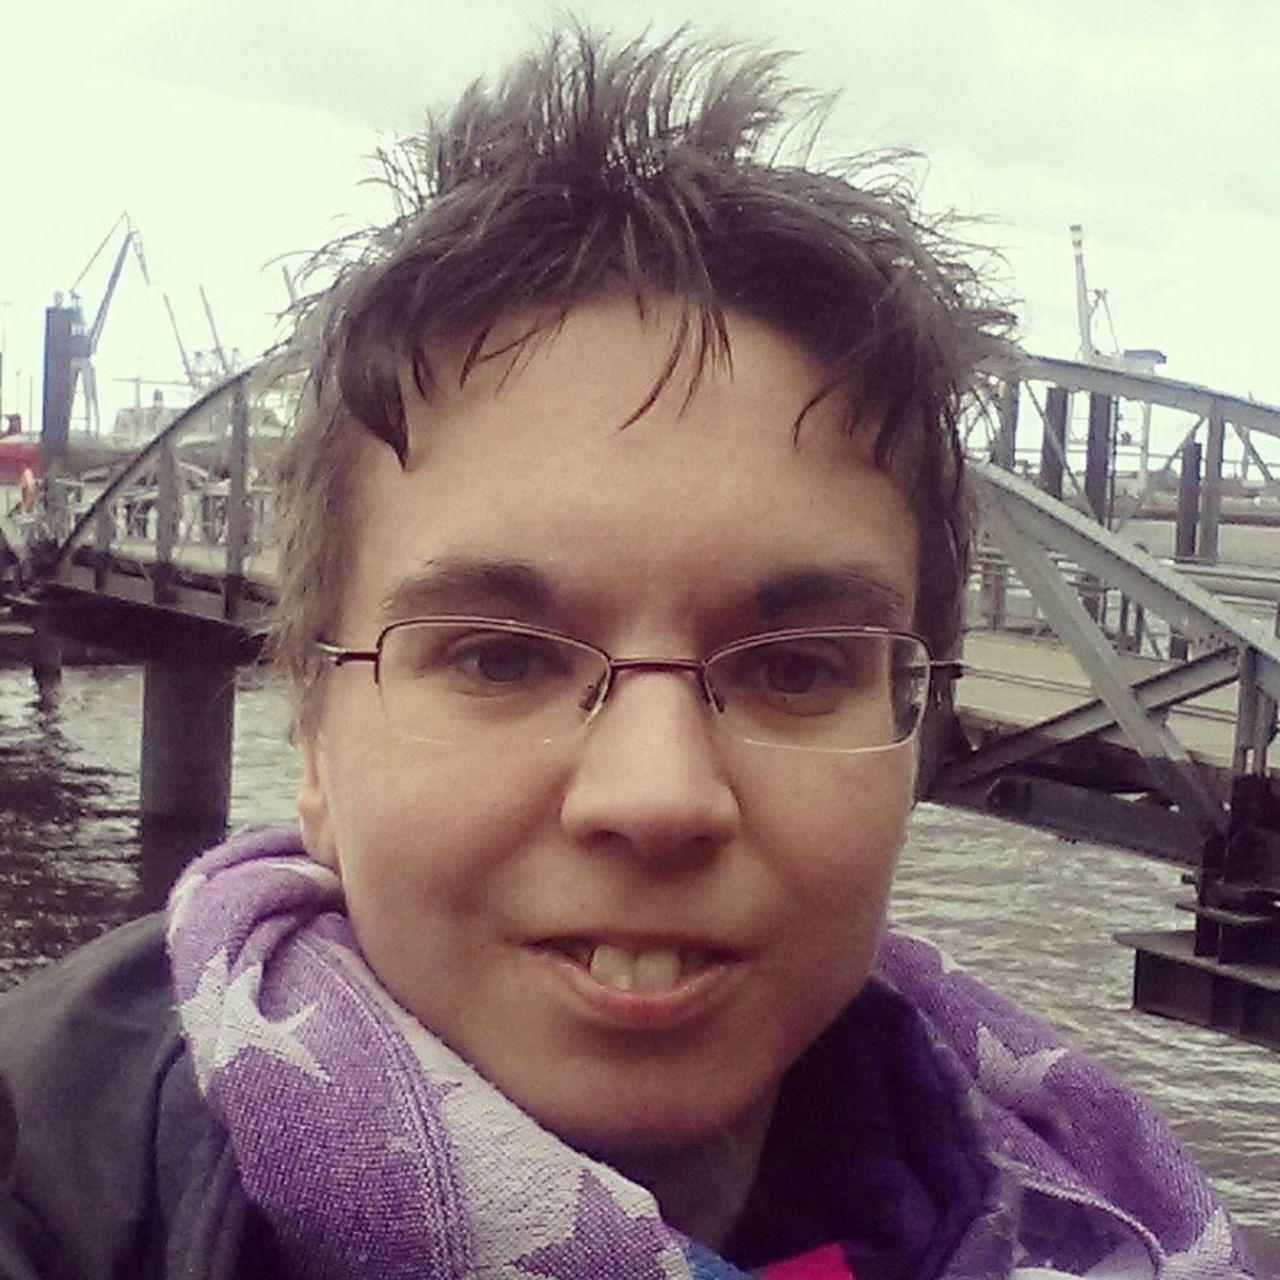 Today - One Year in Hamburg Hamburger Hafen Nice Day